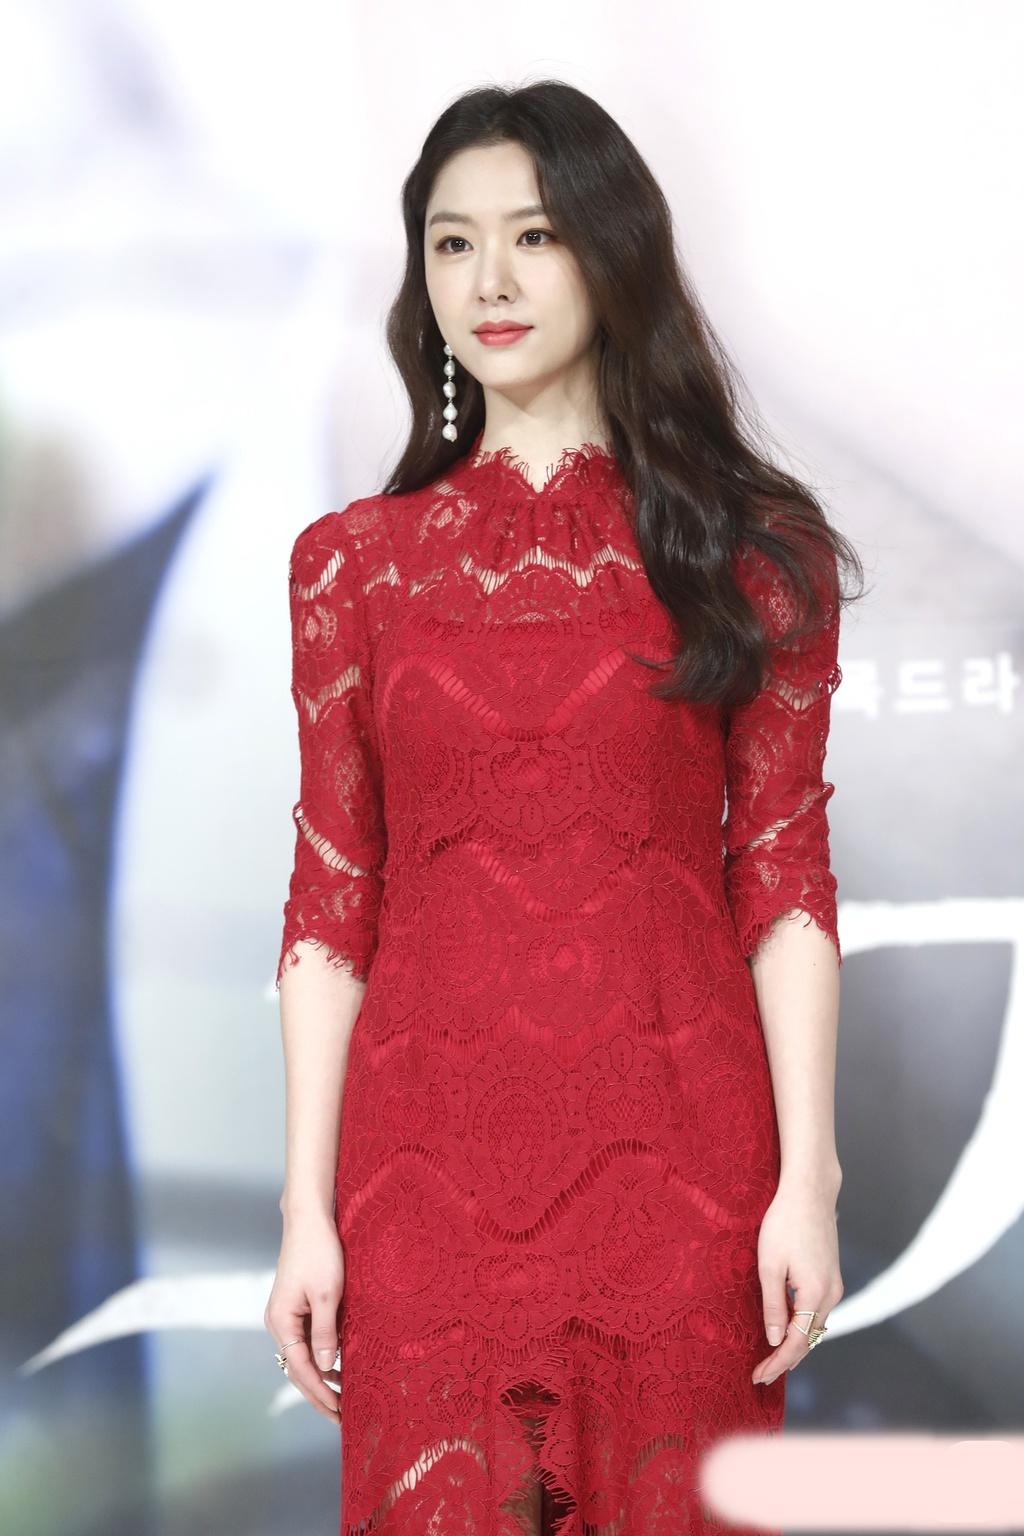 Seo Ji Hye - my nhan co su nghiep lan dan cua 'Ha canh noi anh' hinh anh 17 1.jpg